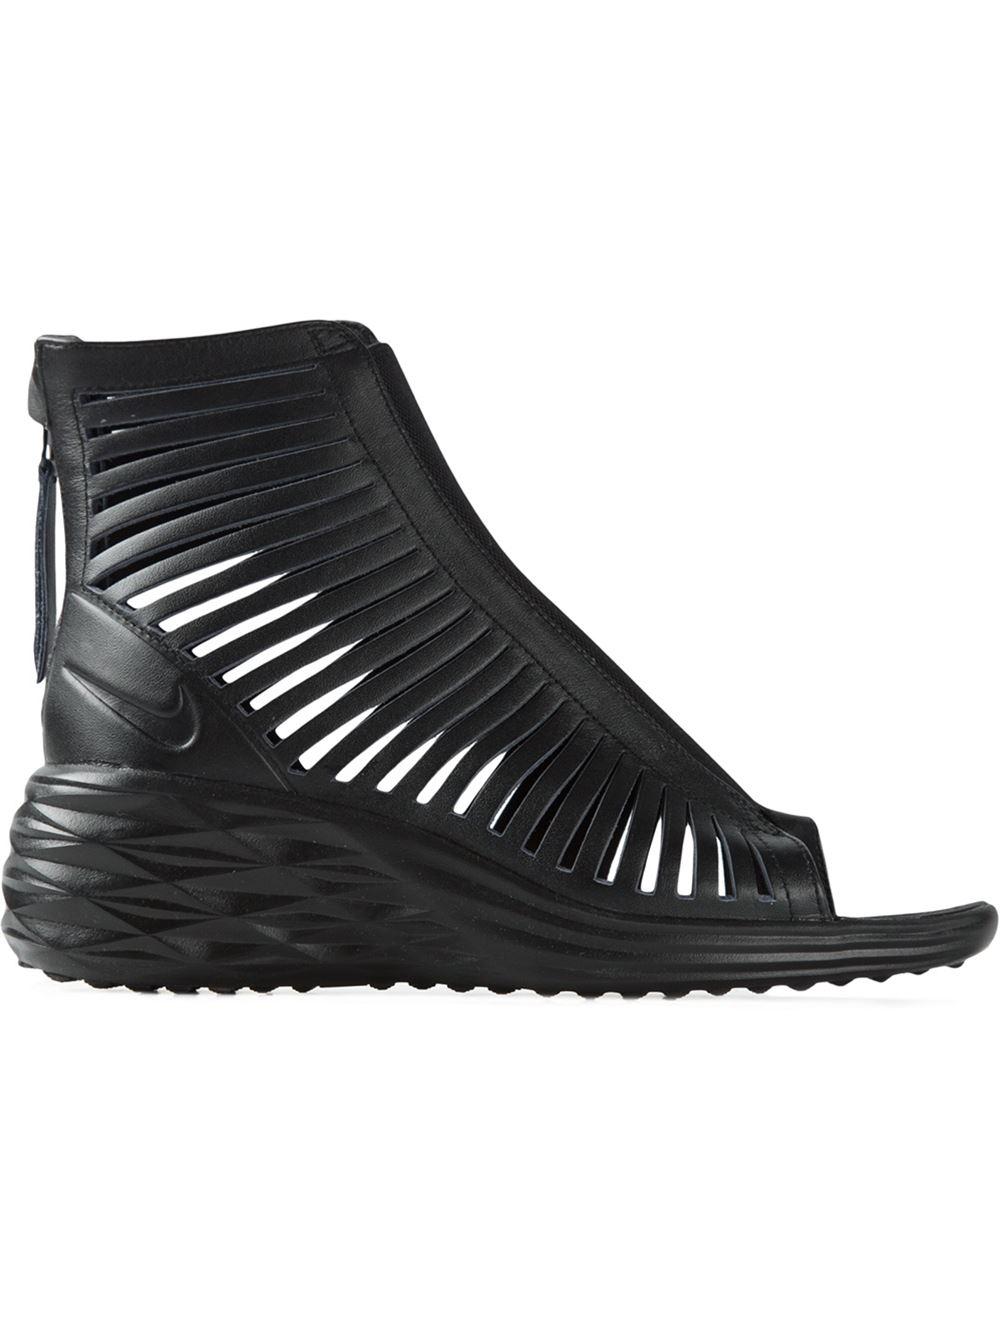 ce5961234b79 ... clearance lyst nike lunarsandiator sandals in black fedaa 7dffb